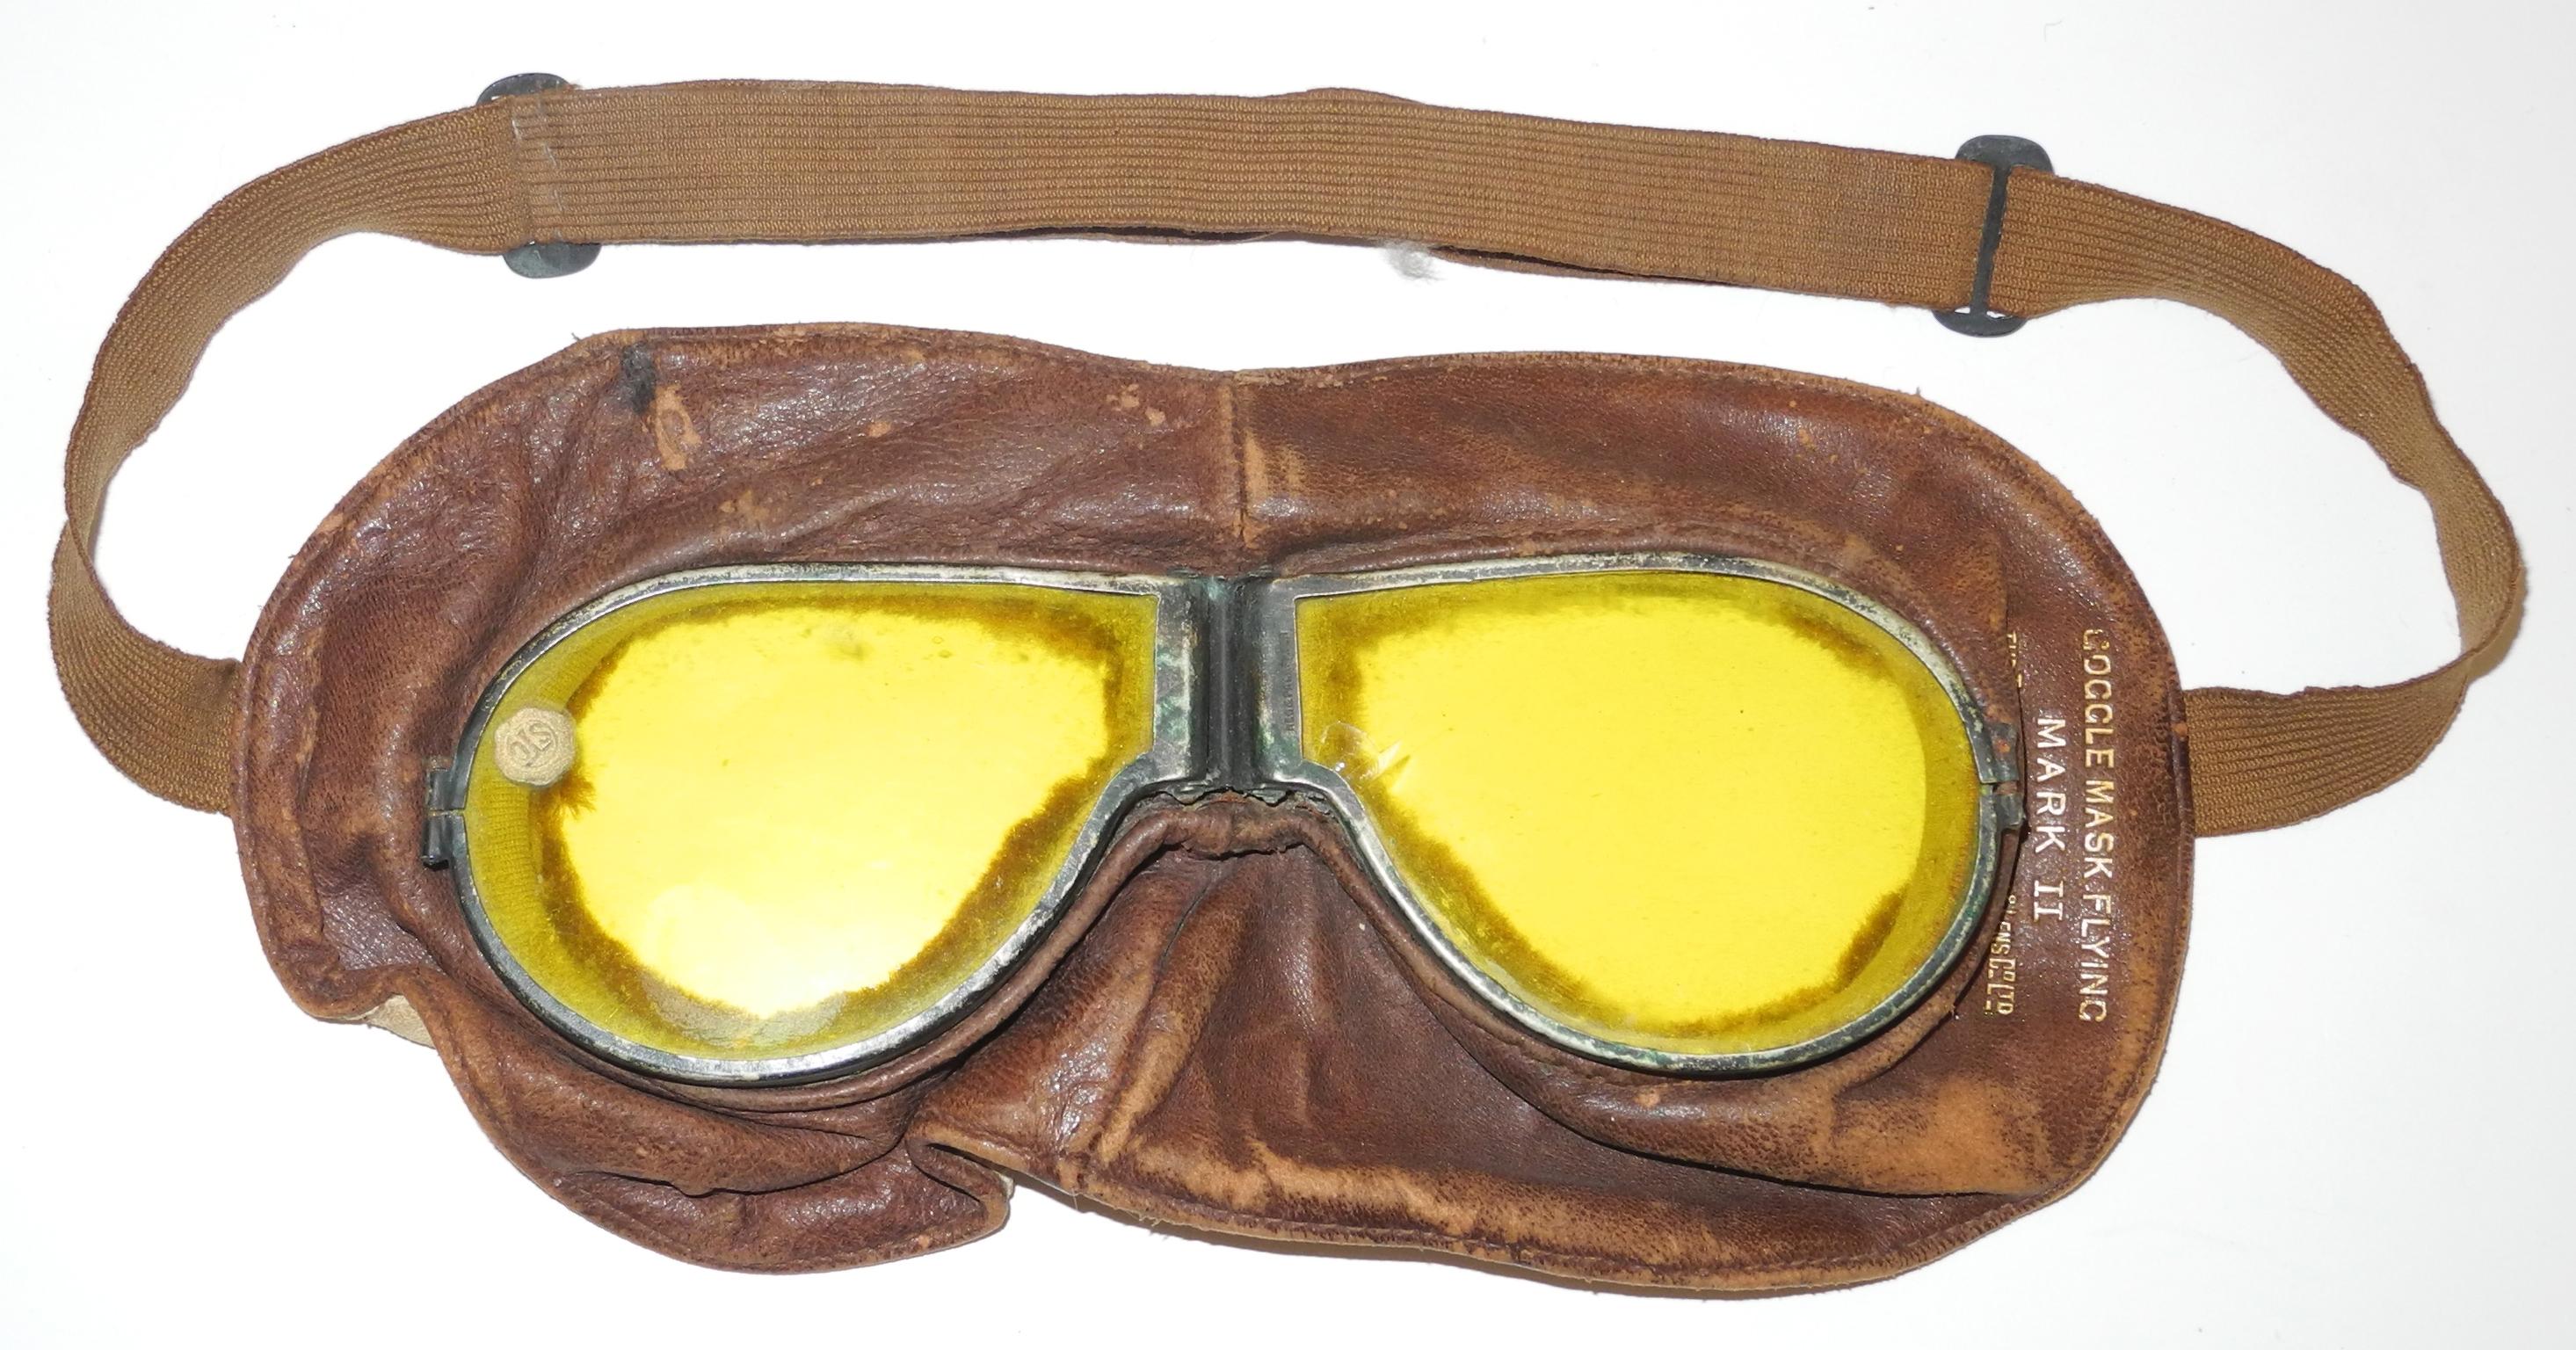 RFC Goggle Mask Mk II by Triplex